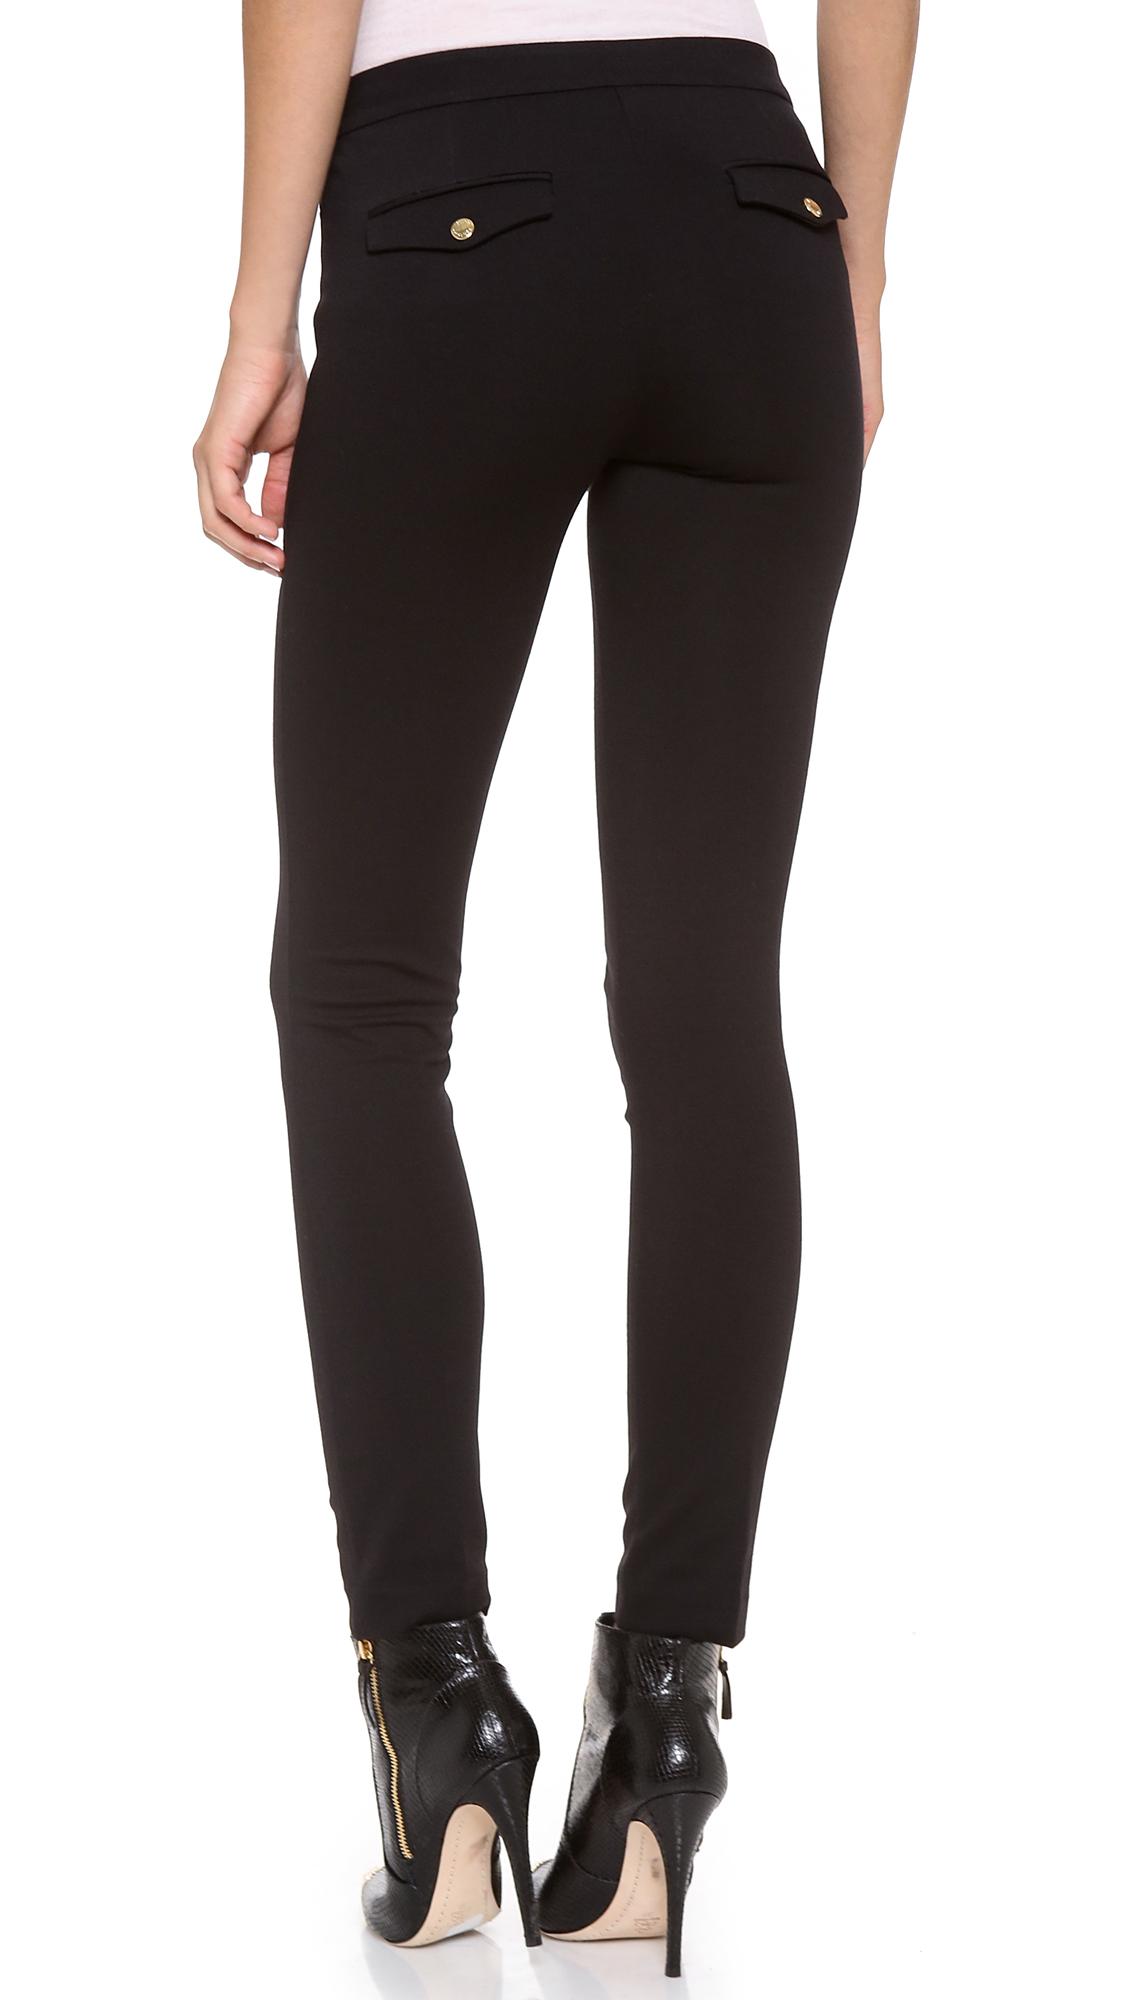 lyst juicy couture ponte pants in black. Black Bedroom Furniture Sets. Home Design Ideas